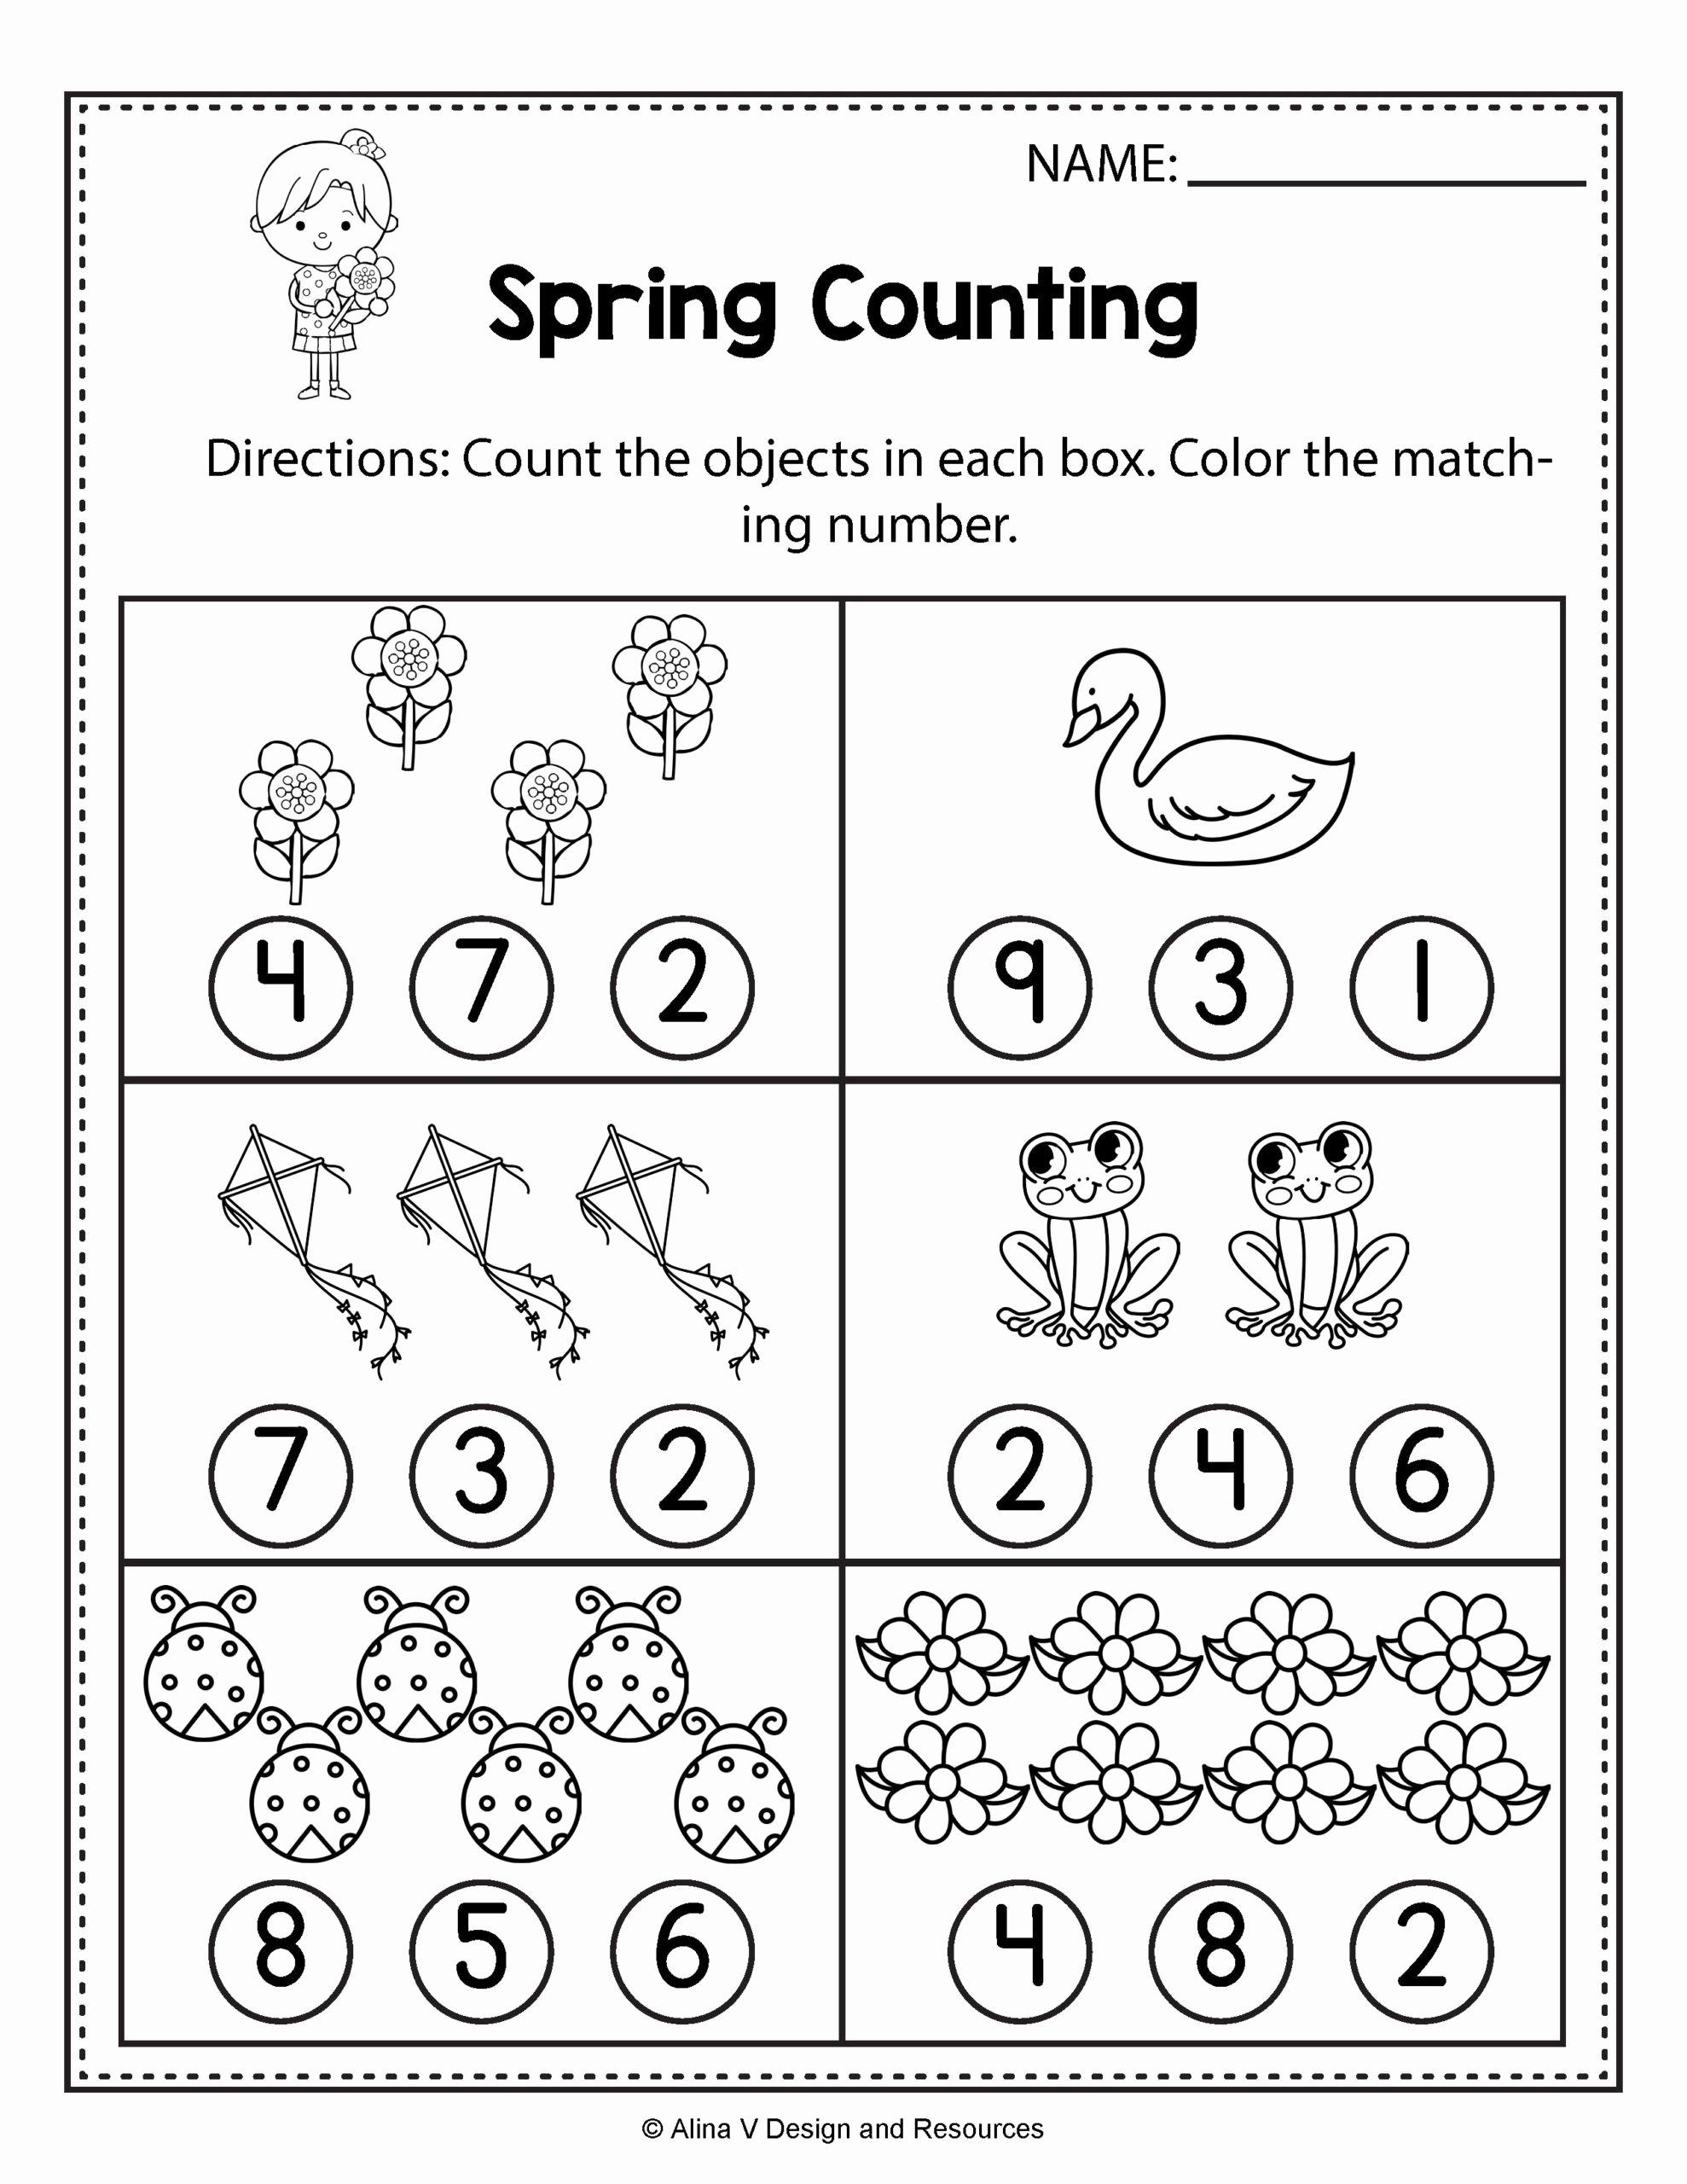 Problem solving Worksheets for Preschoolers Inspirational Weather Activities Worksheet for Preschool Printable